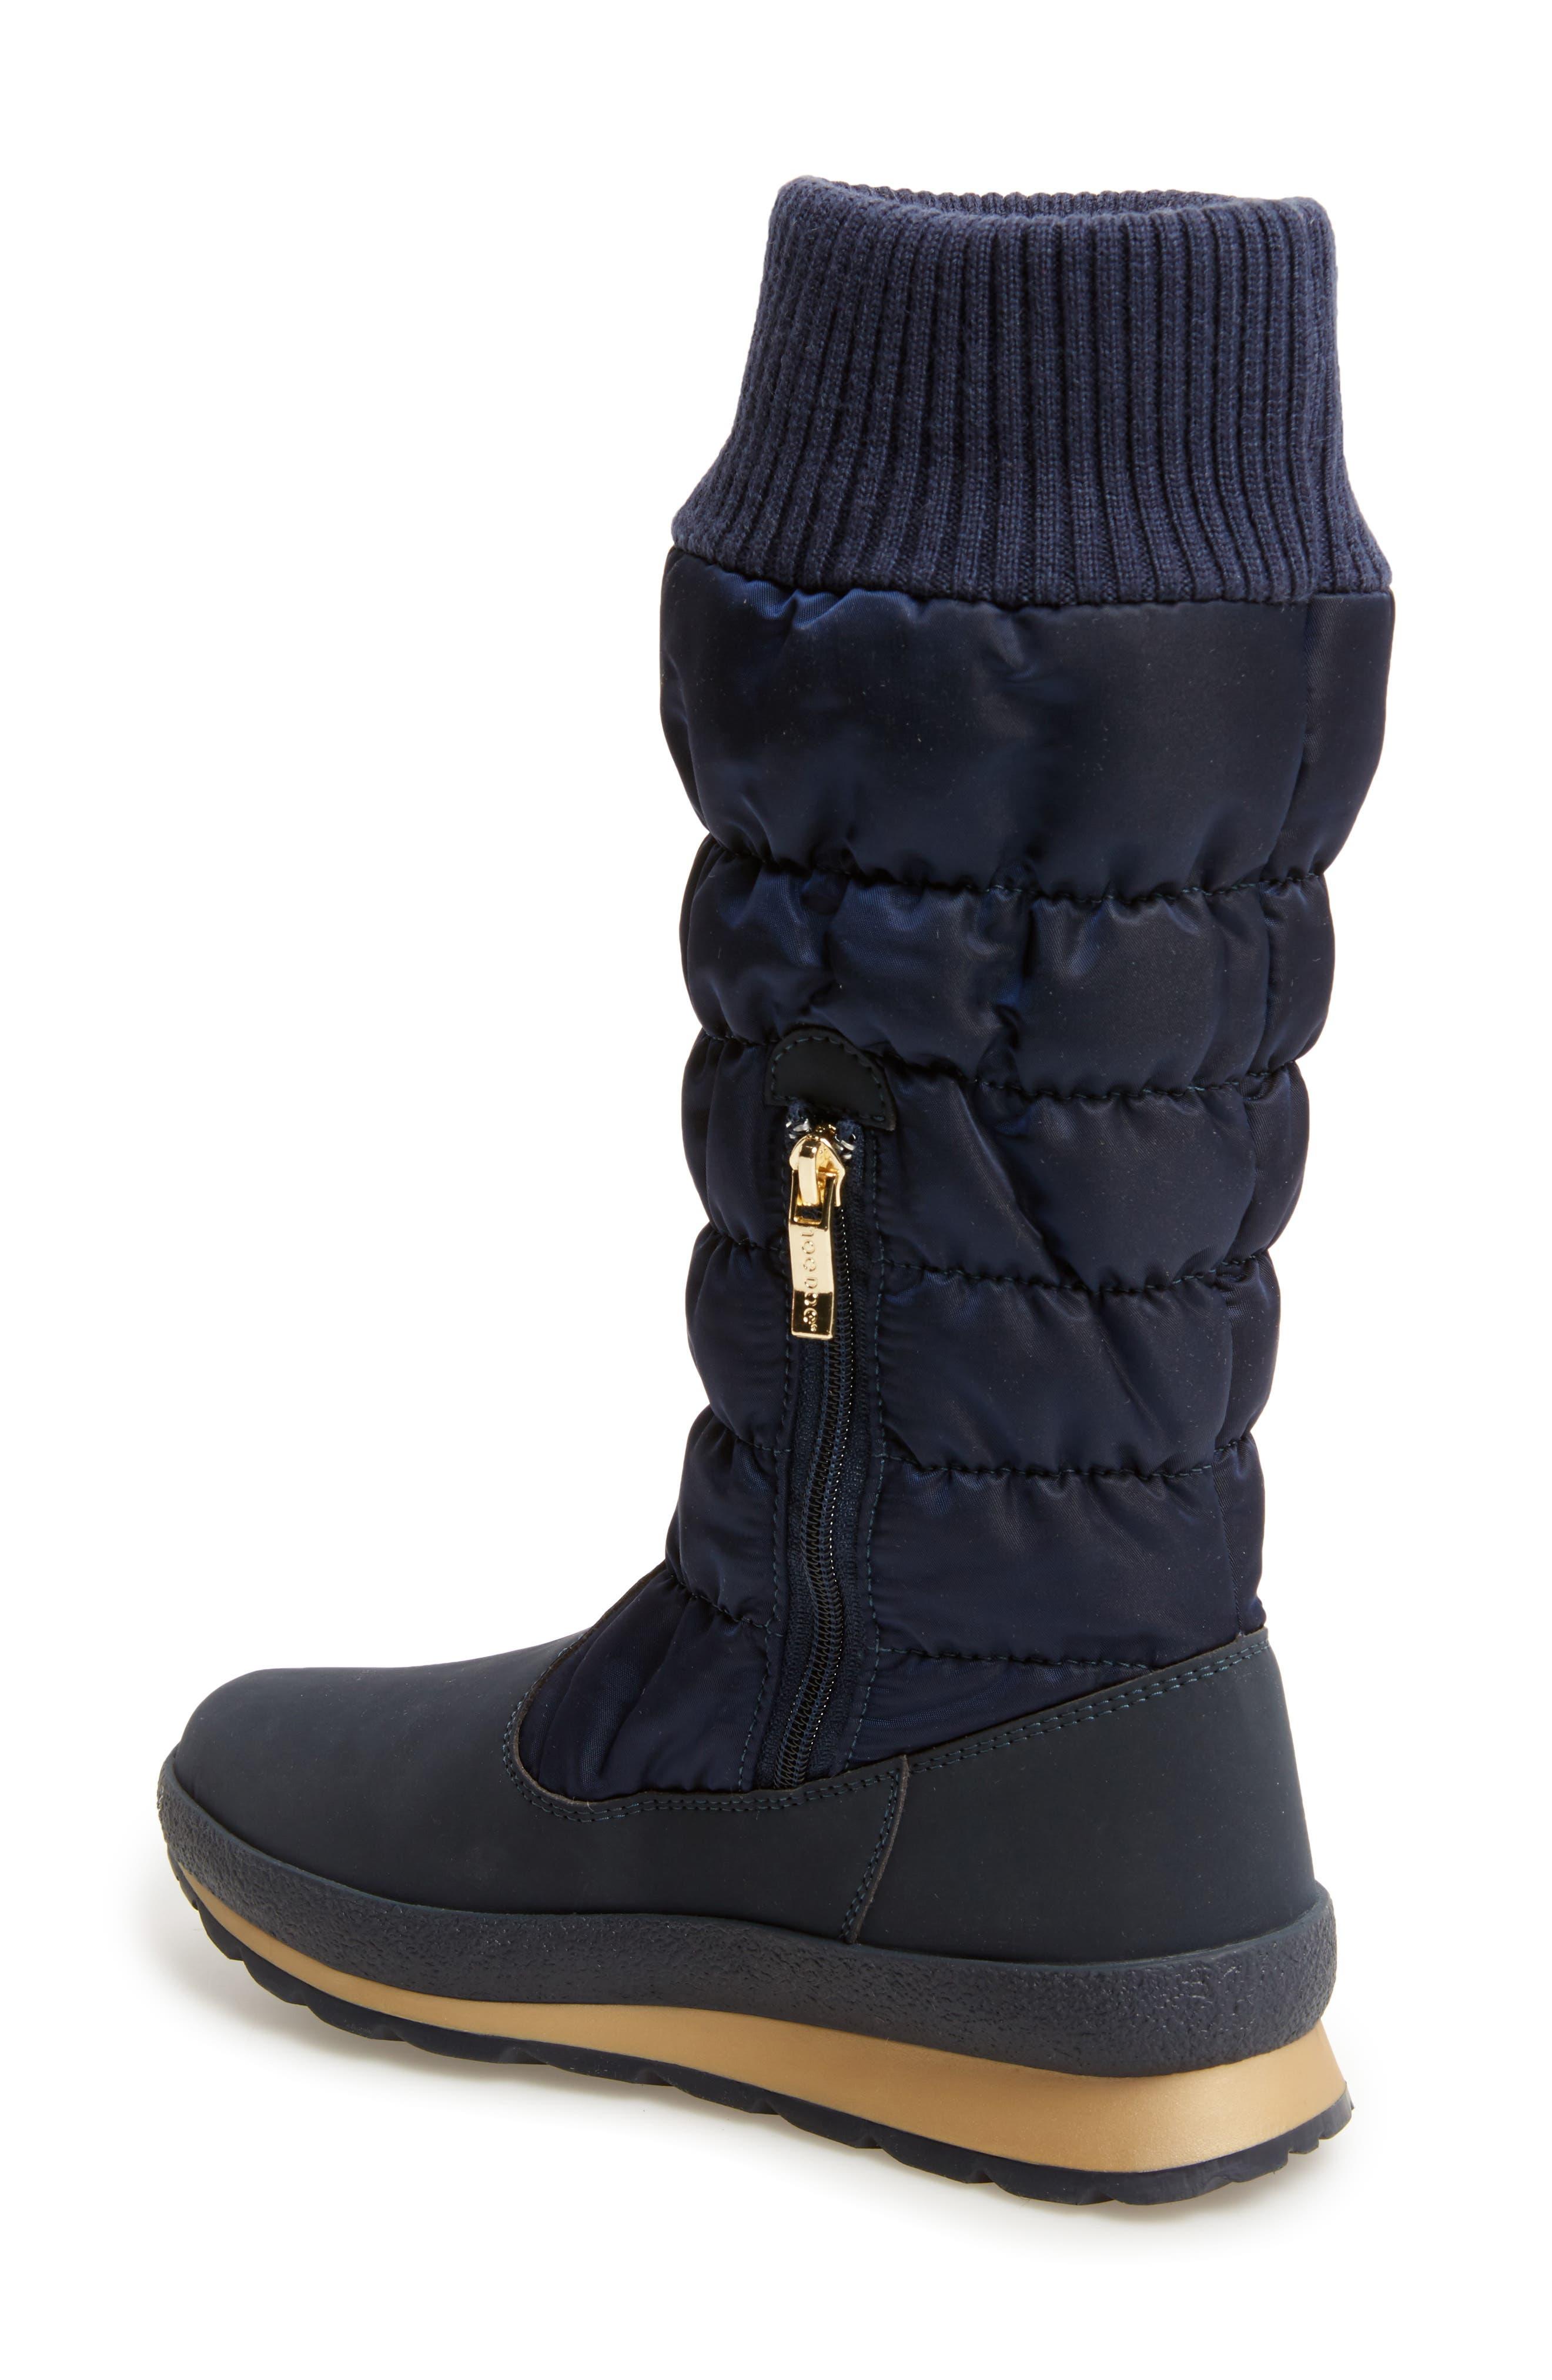 Alternate Image 2  - JOG DOG St. Anton Waterproof Winter Boot (Women)